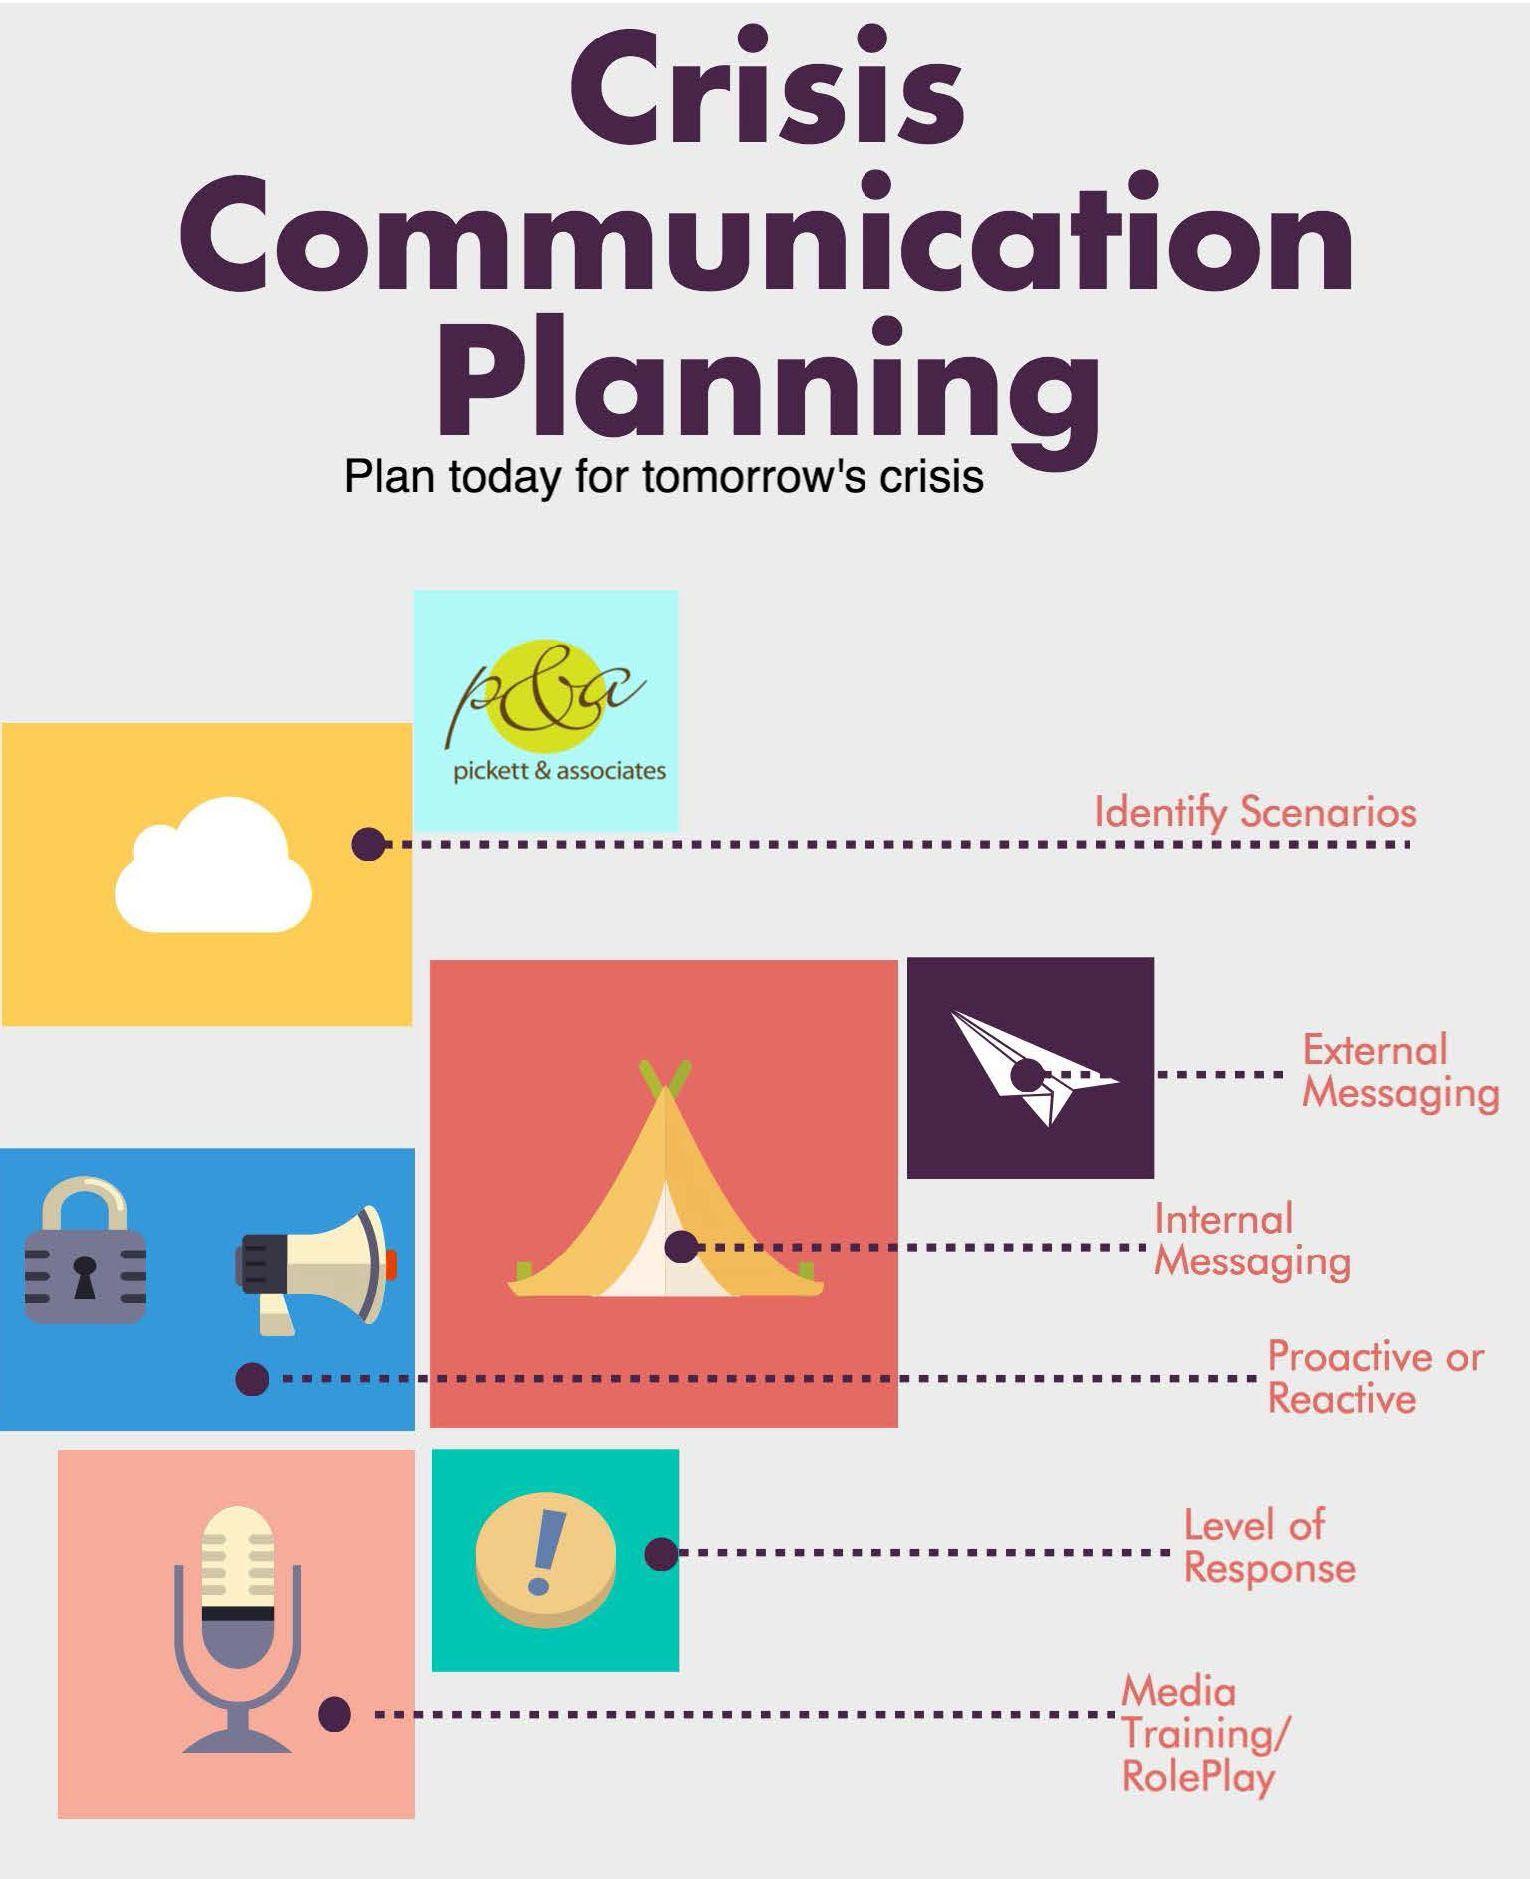 003 Phenomenal Crisi Communication Plan Template High Definition  For Higher Education NonprofitFull